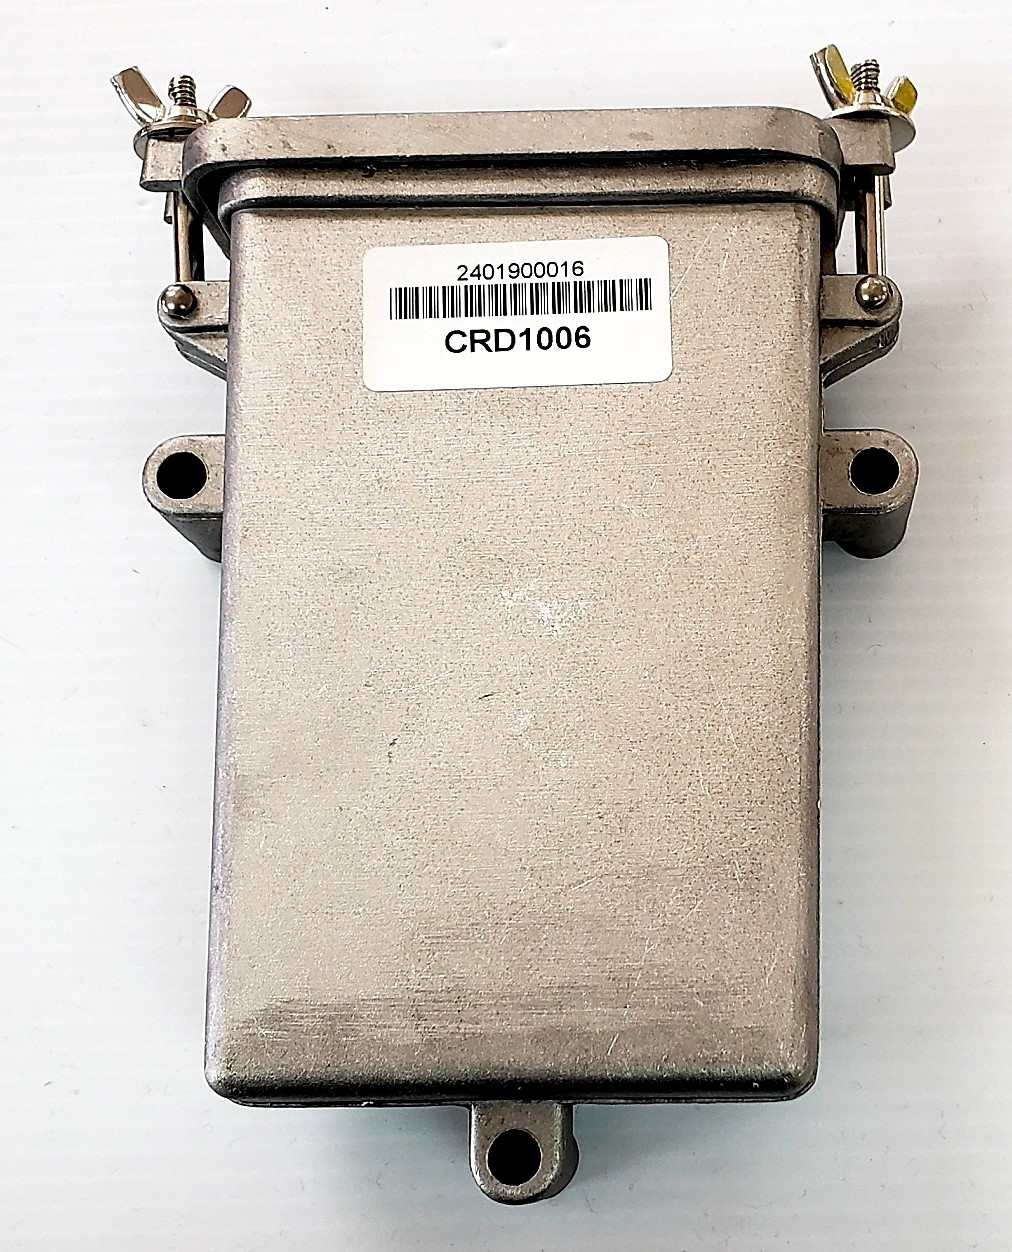 Waterproof Document Box CRD1006